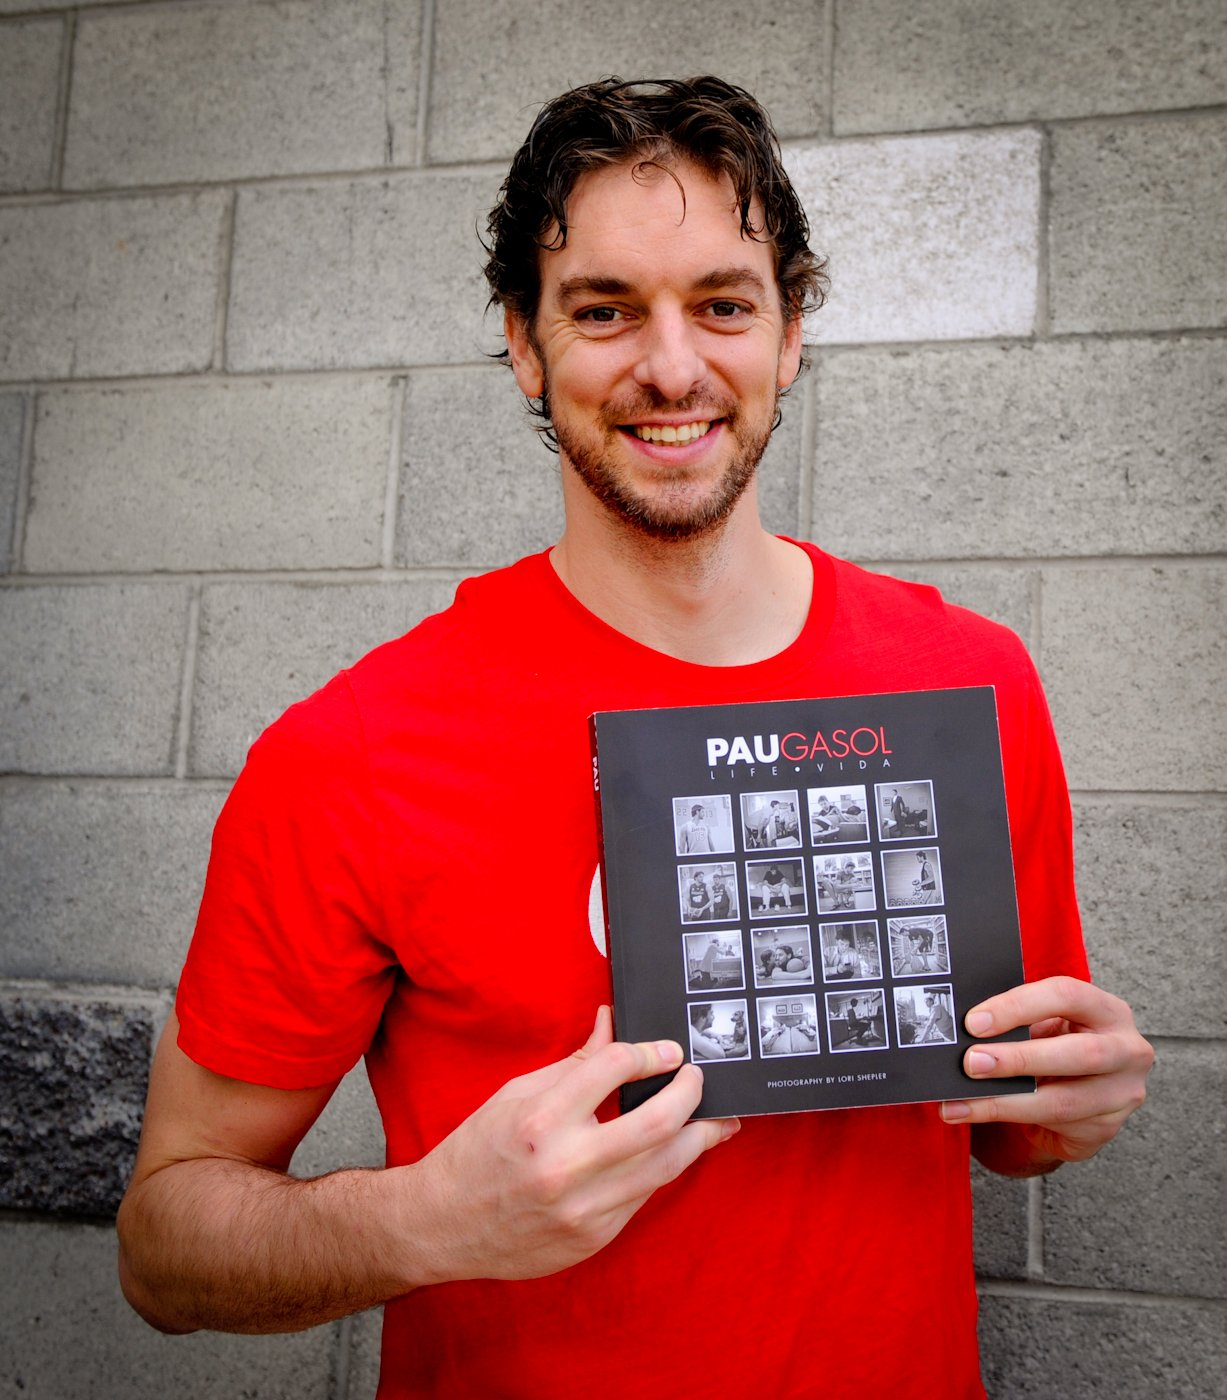 Pau Gasol: Life / Vida: Amazon.es: Gasol, Pau, Jackson, Phil, Bryant, Kobe, Navarro, Juan Carlos, Shepler, Lori: Libros